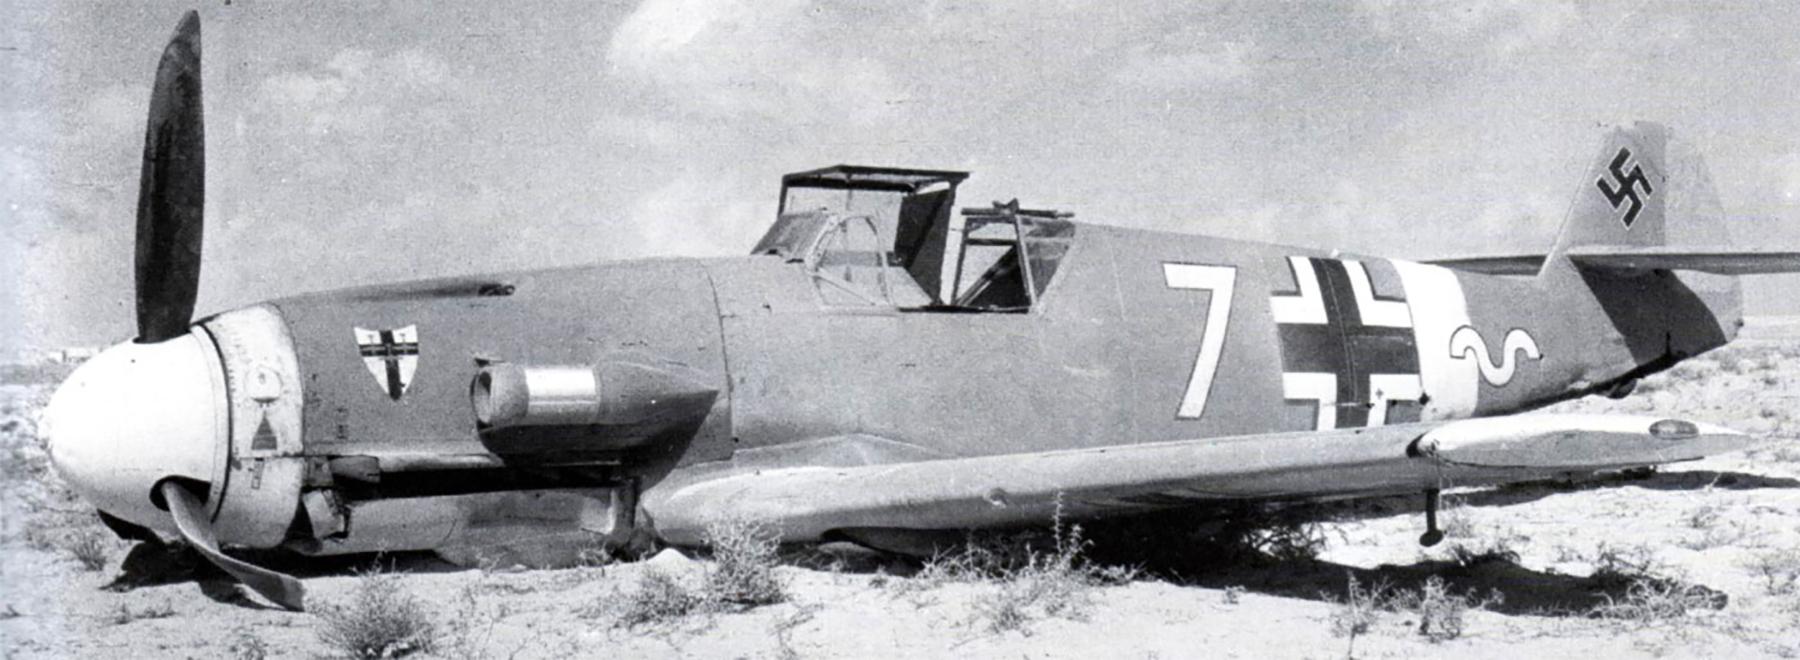 Messerschmitt Bf 109F4Trop 9.JG27 Yellow 7 Helmuth Fenzl WNr 13136 crash Egypt 26th Oct 1942 01